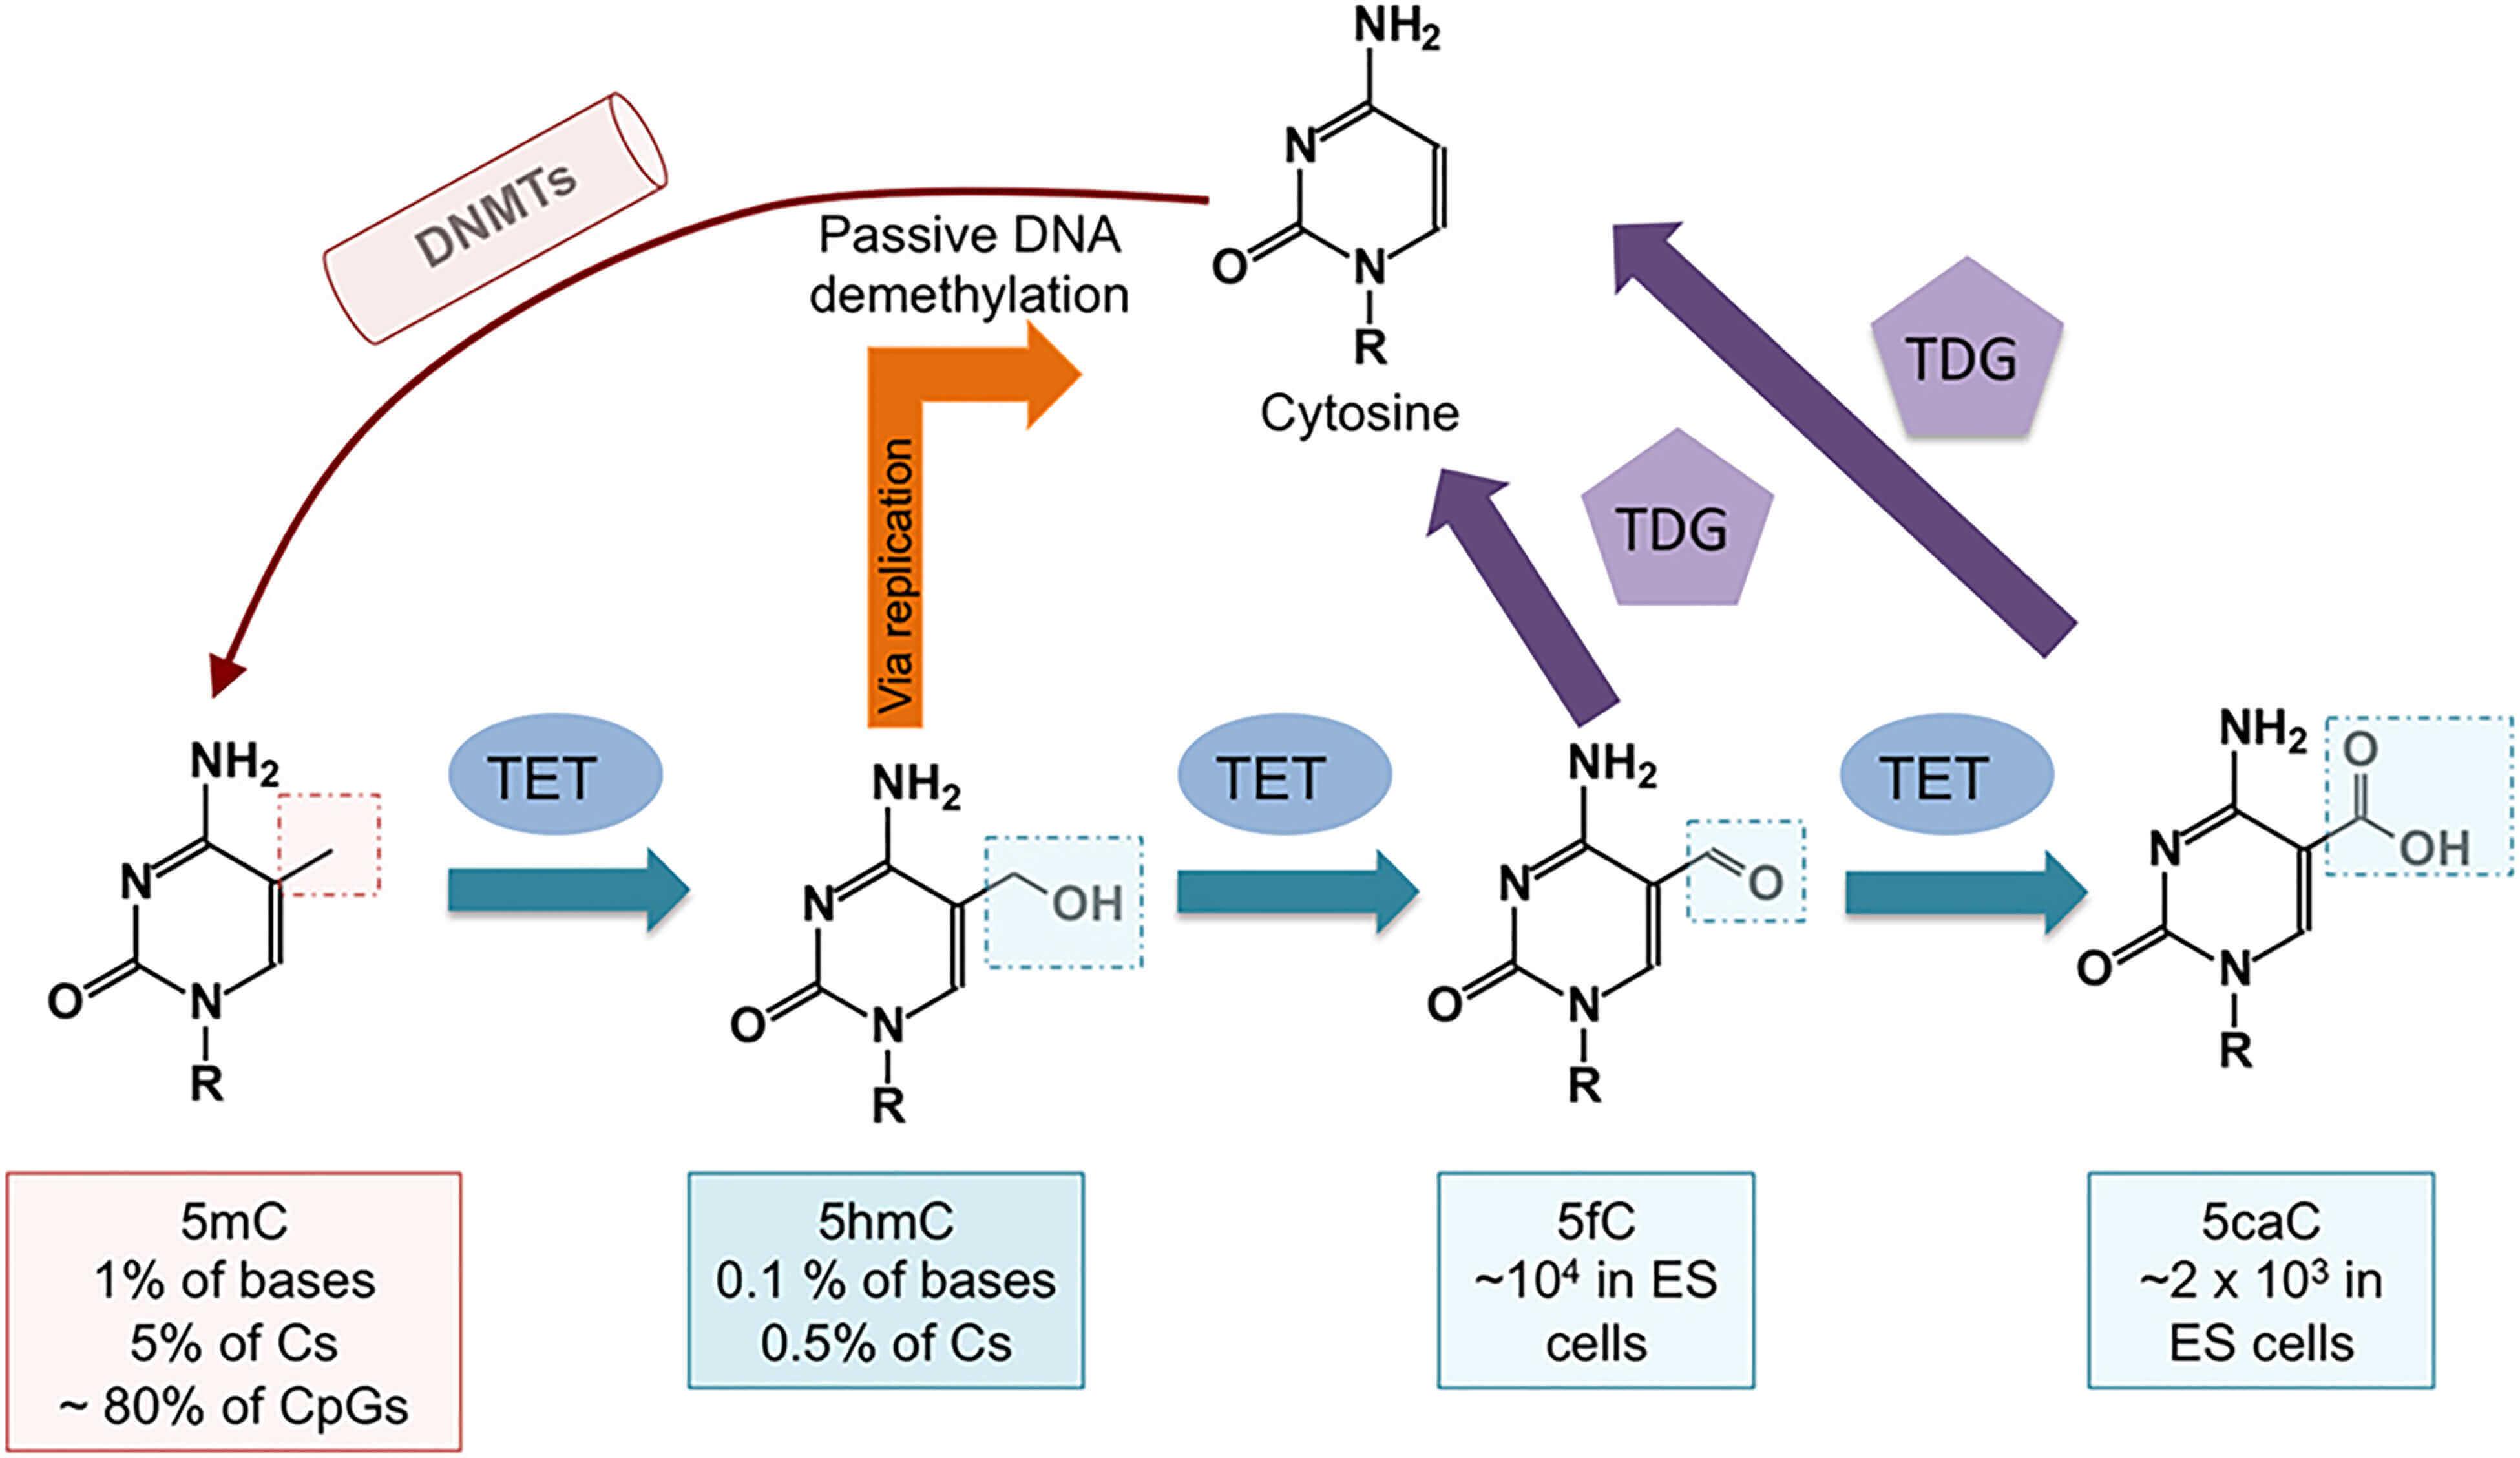 Schematic diagram of DNA methylation variants